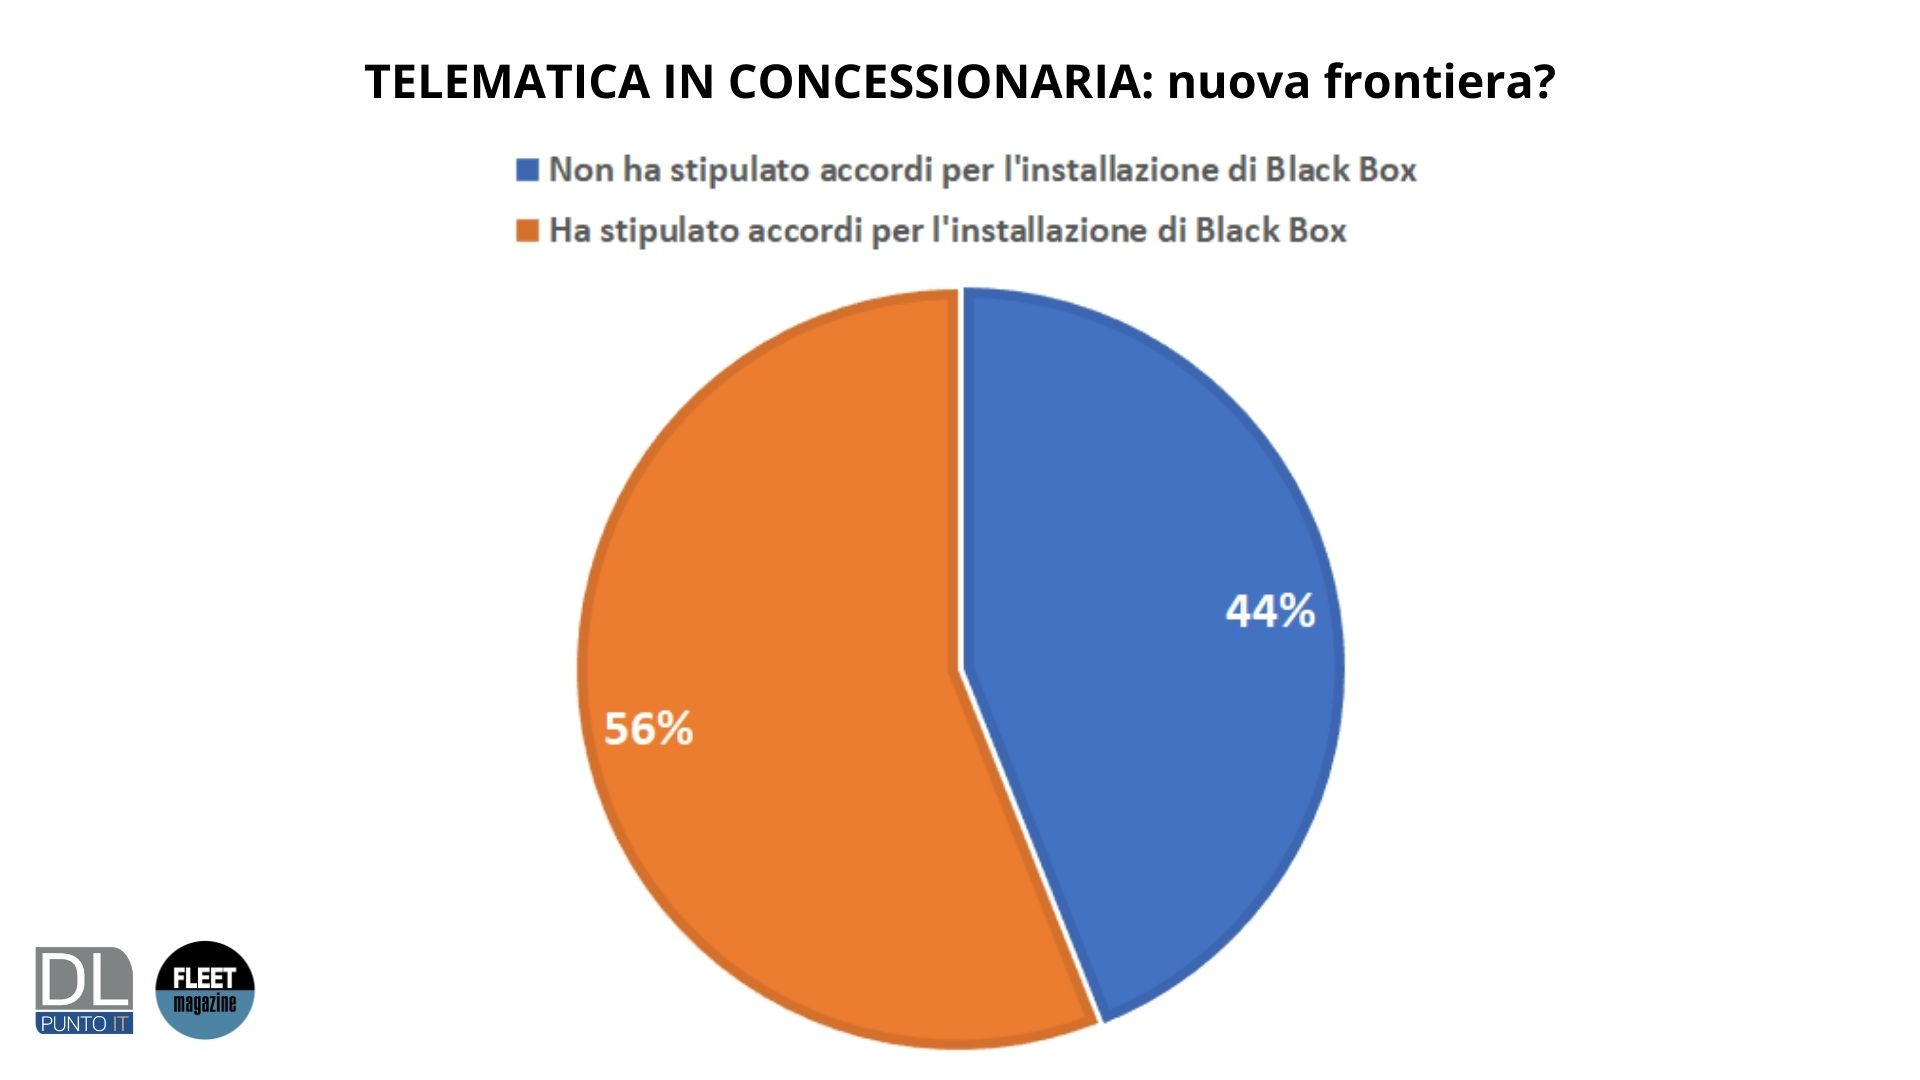 telematica concessionaria survey